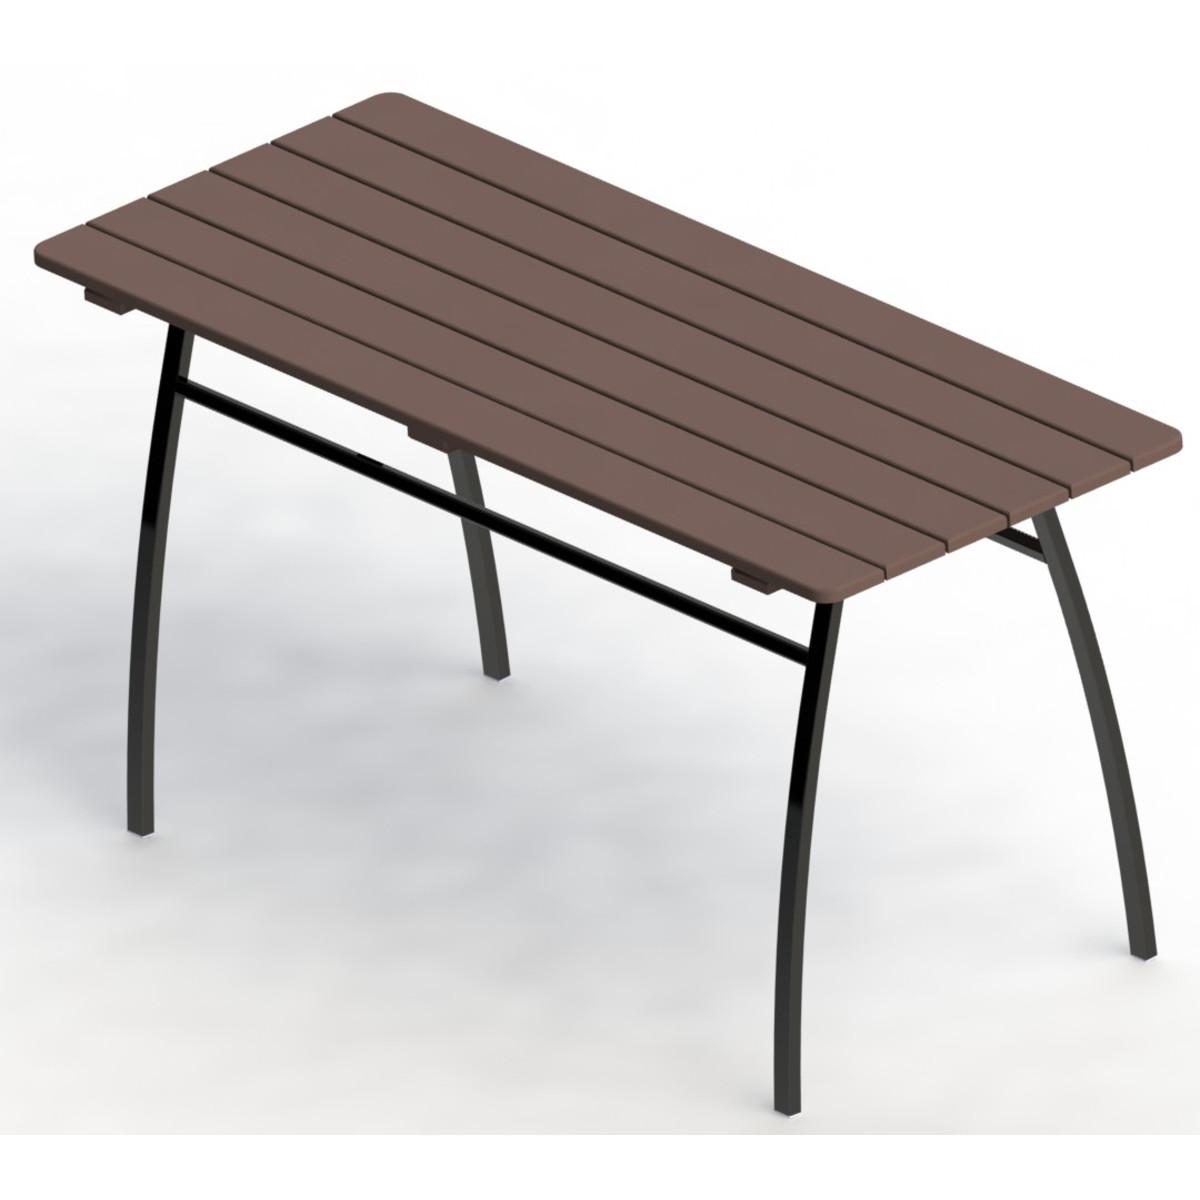 Стол садовый разборный Garden 146х75х60 см металл/дерево каштановый